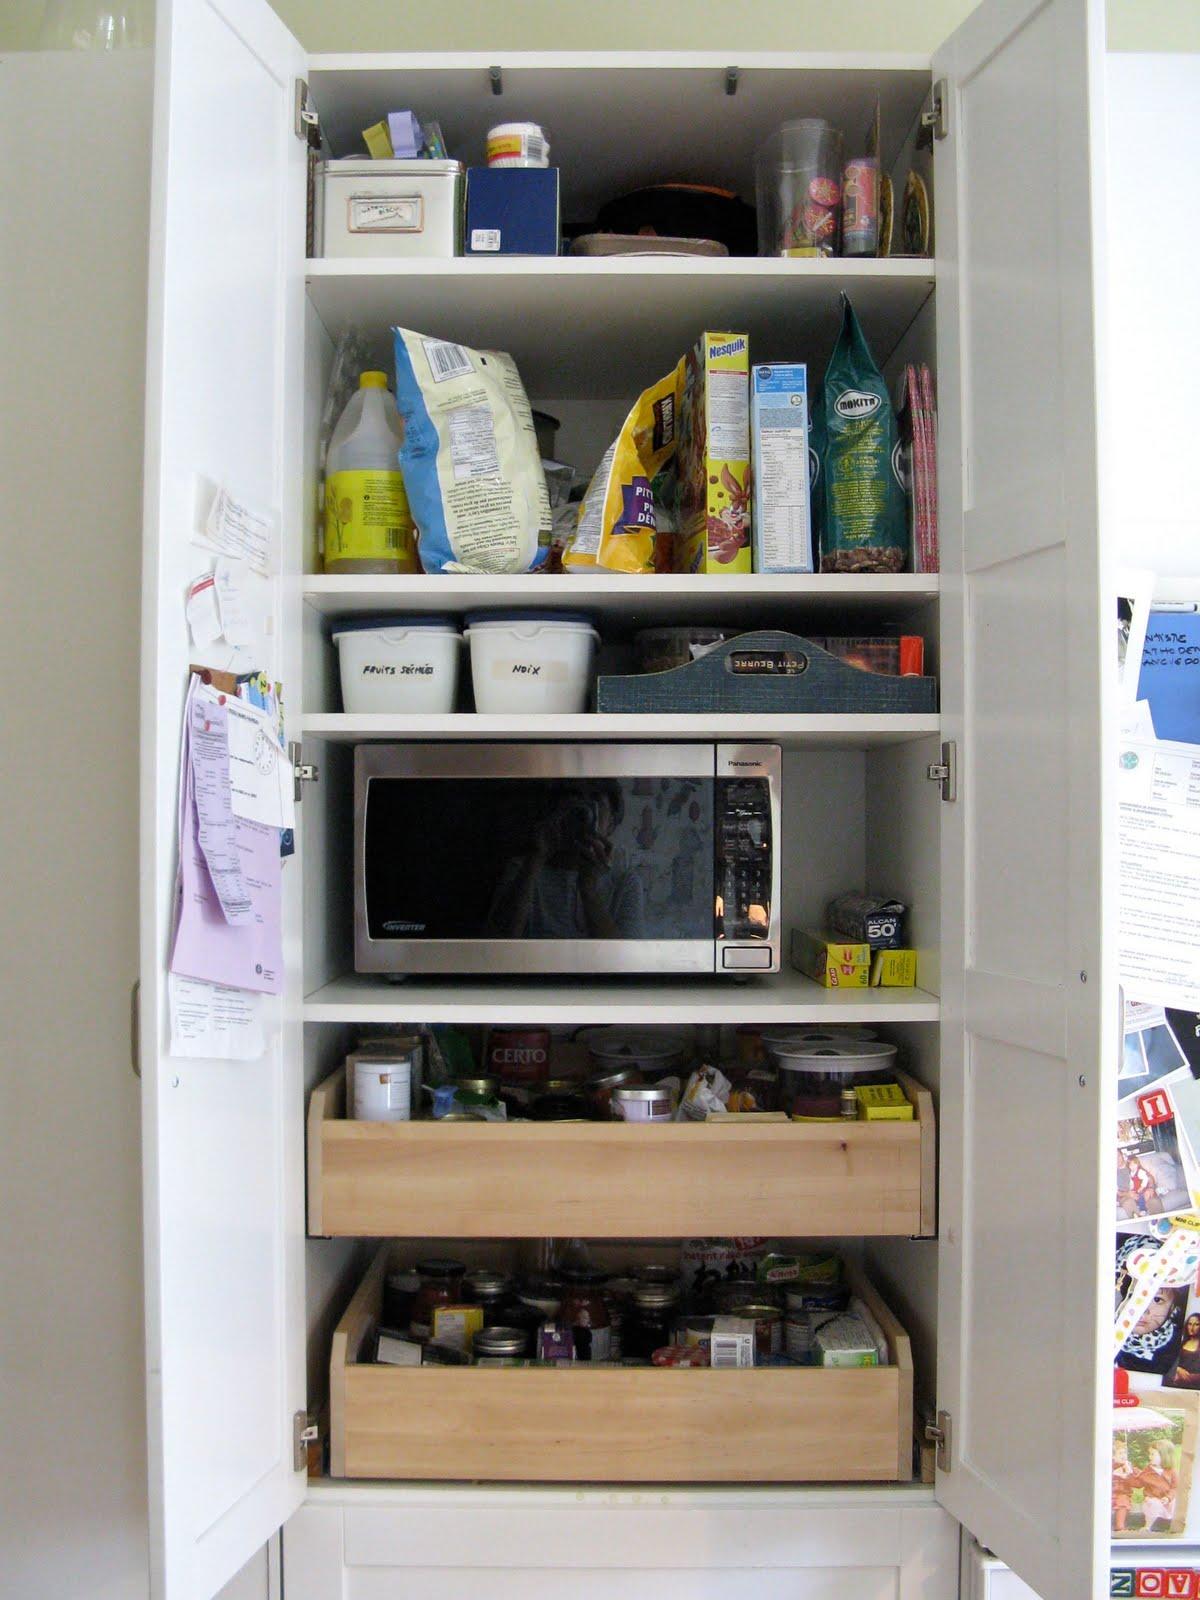 armoire garde manger ikea table de lit. Black Bedroom Furniture Sets. Home Design Ideas